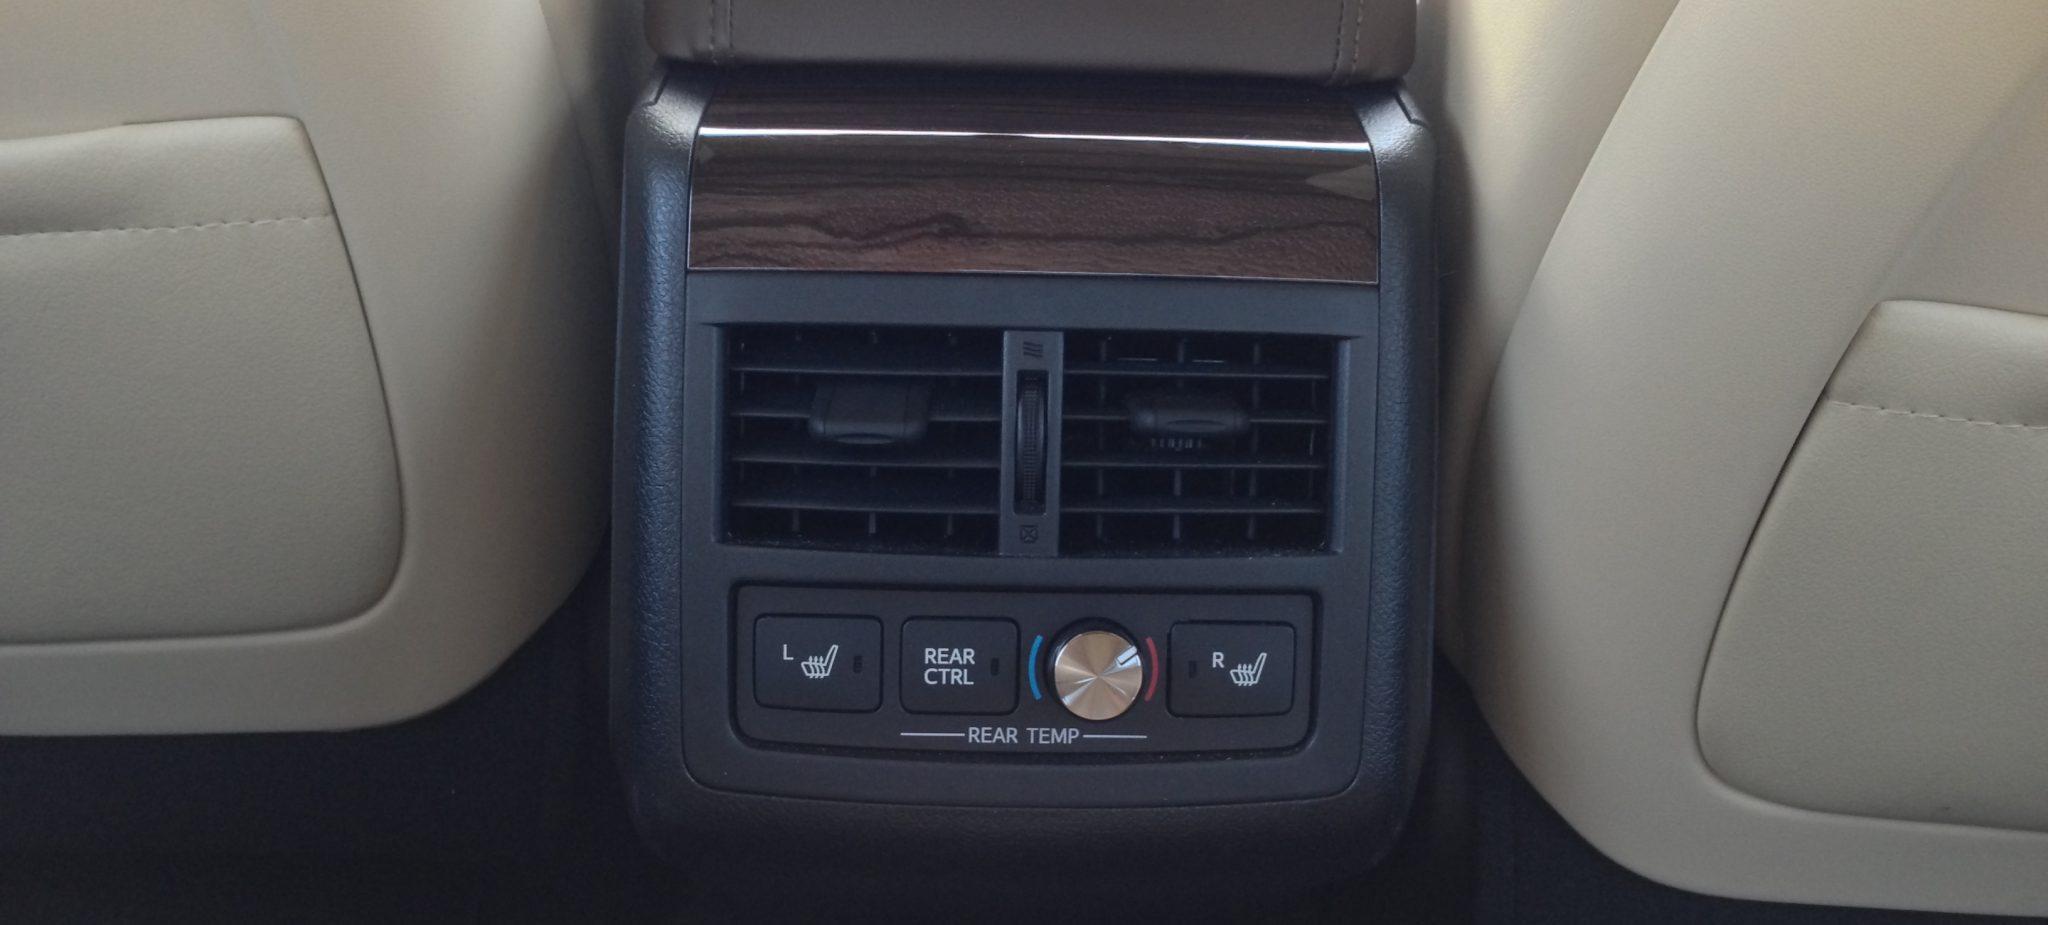 Avalon Rear Heating